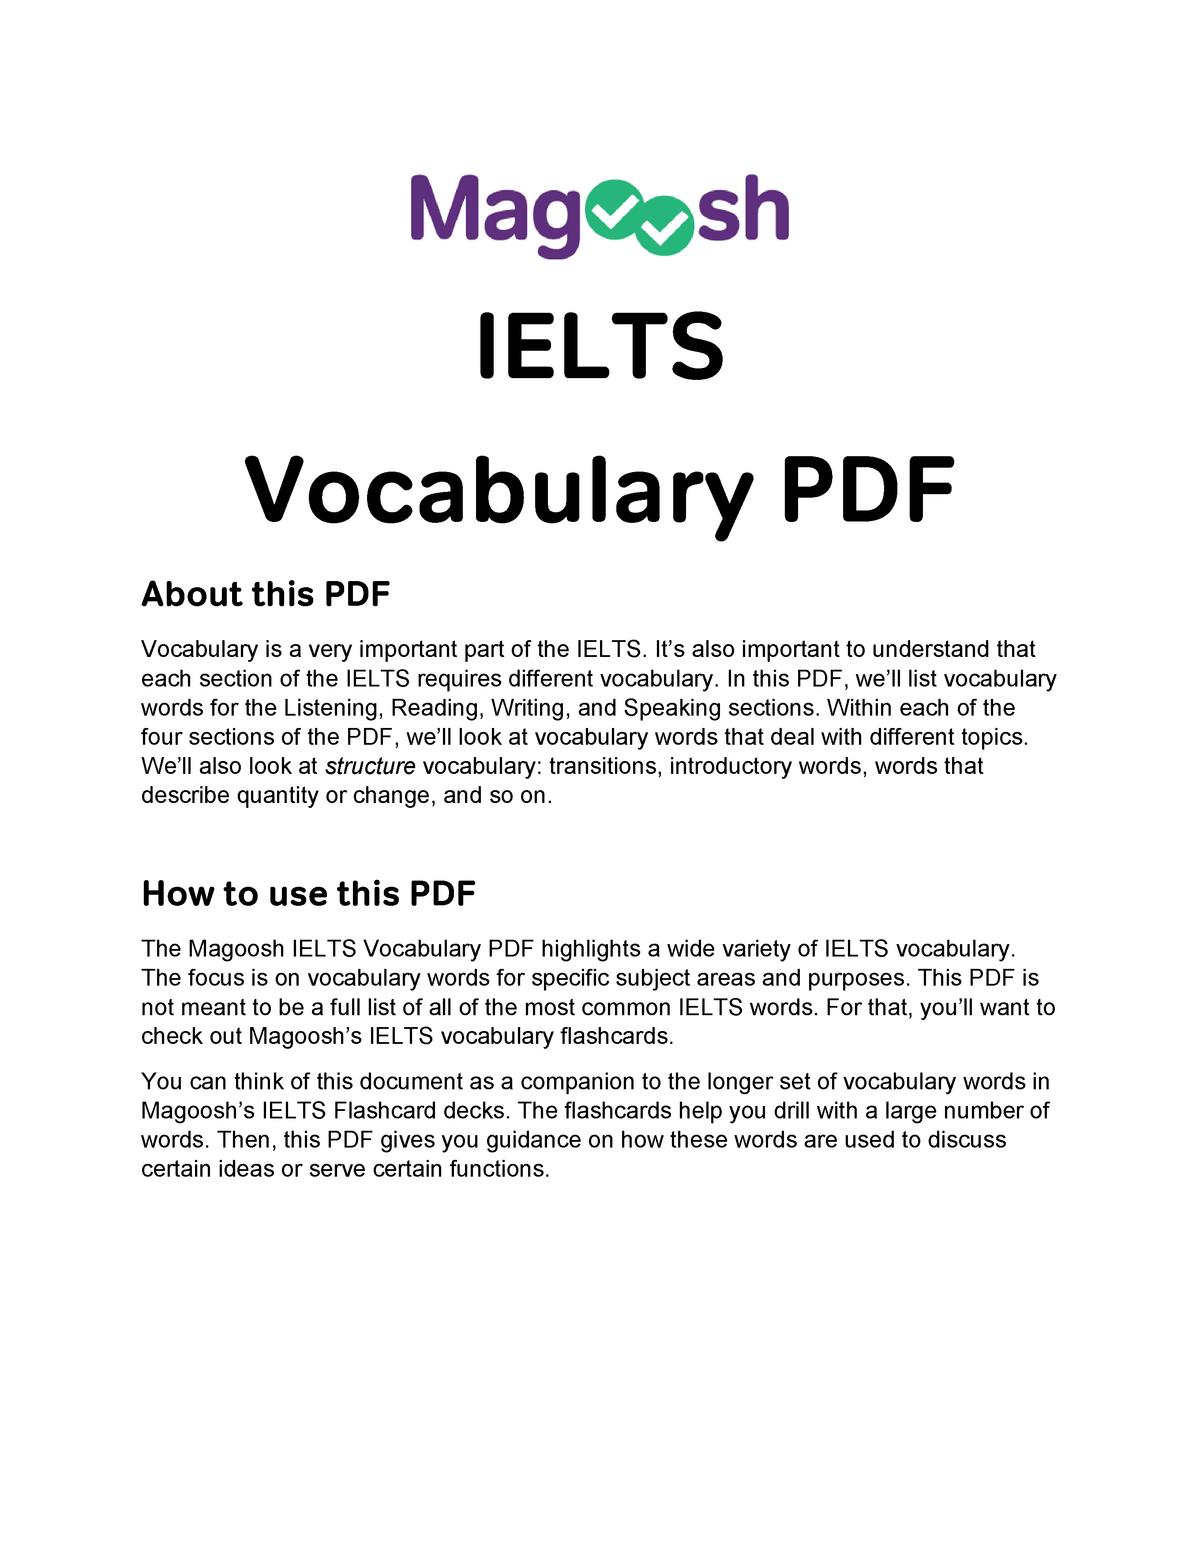 Magoosh+ Ielts+Vocabulary+PDF - 101825 - UWS - StuDocu